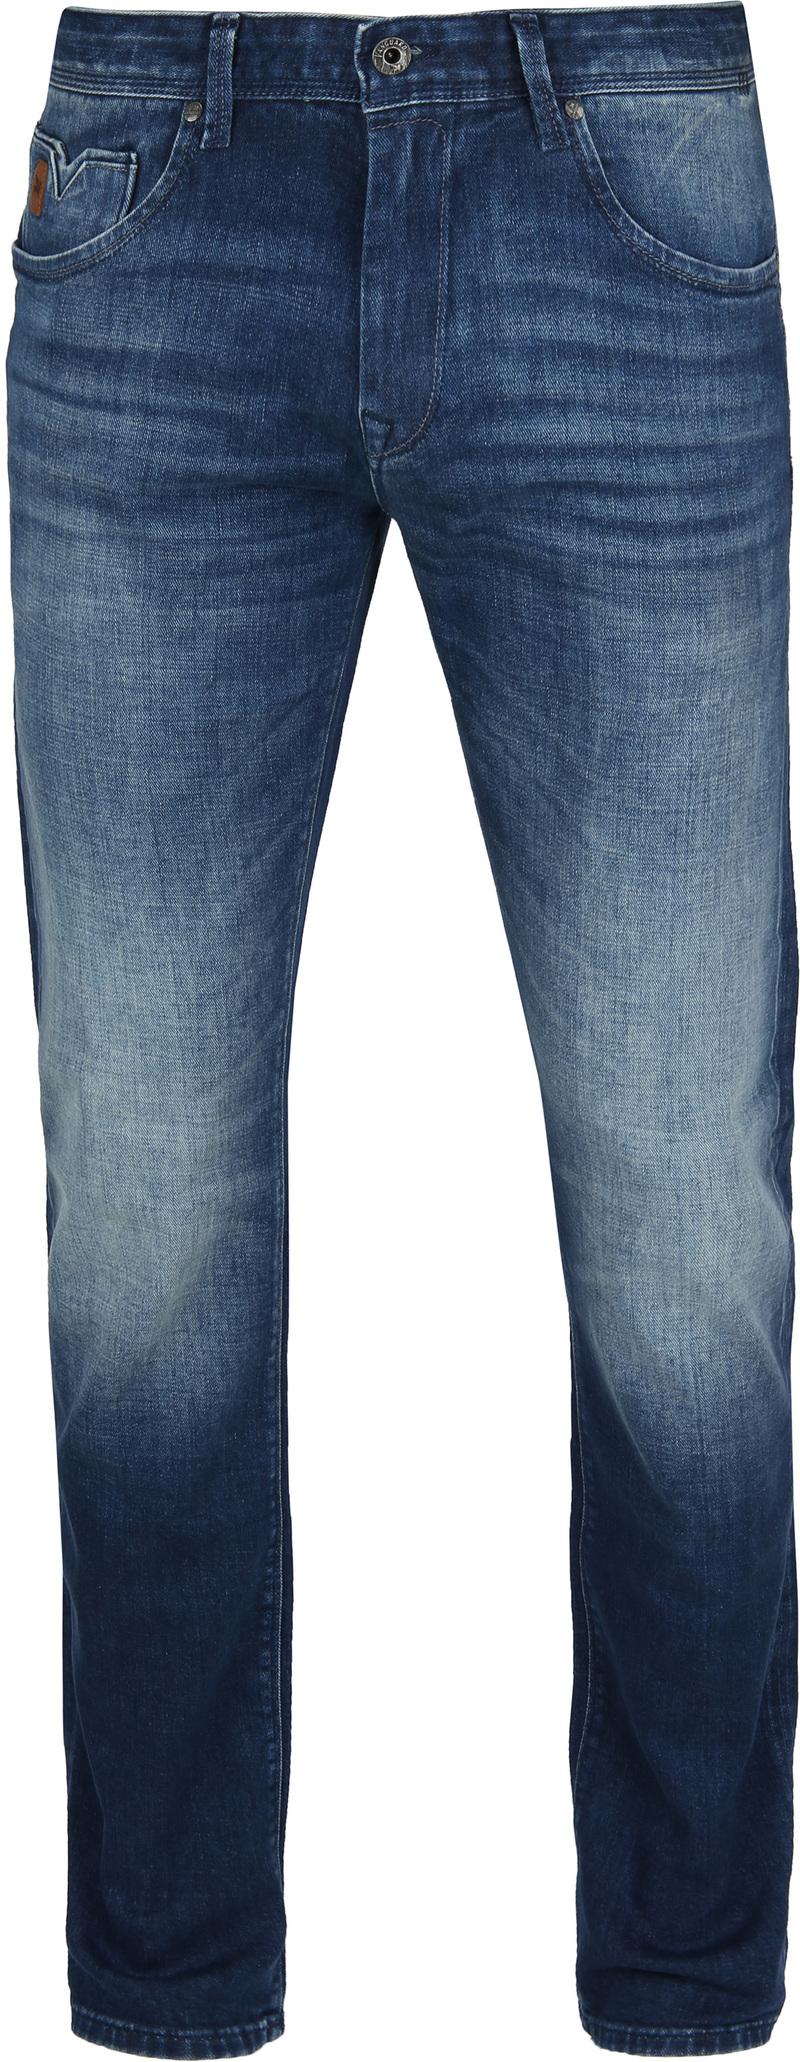 Vanguard V7 Rider Jeans New Blue Electric